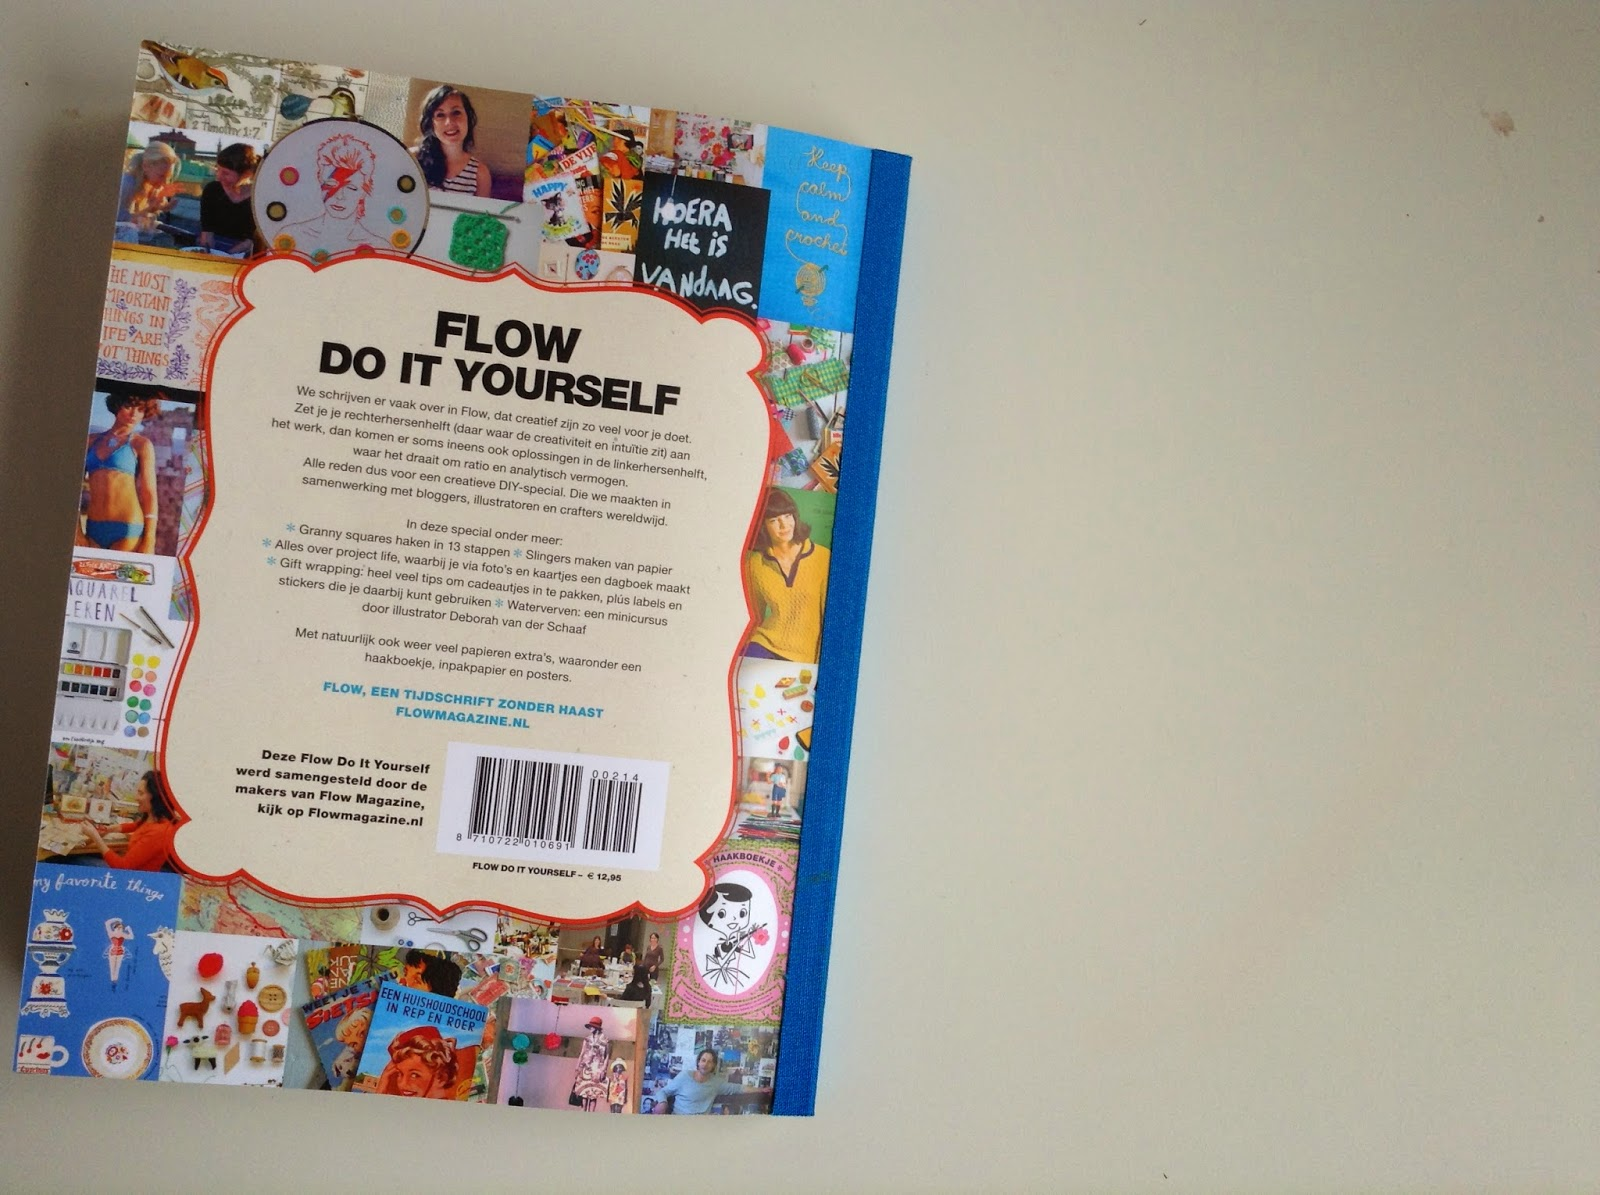 Babsies lifestyle flow do it yourself book vrijdag 11 april 2014 solutioingenieria Gallery